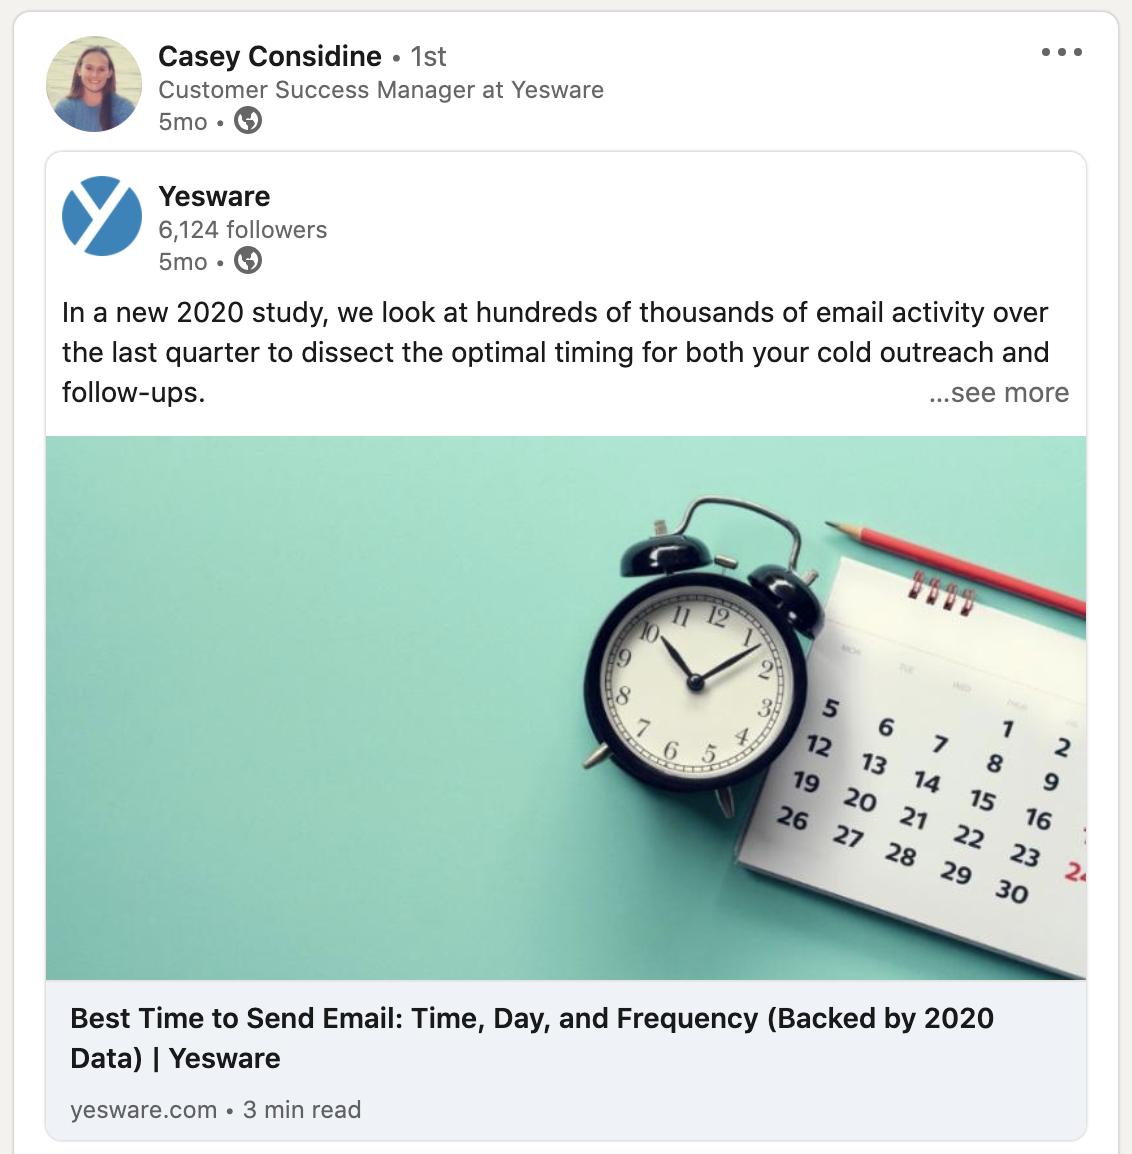 using LinkedIn for sales - posting